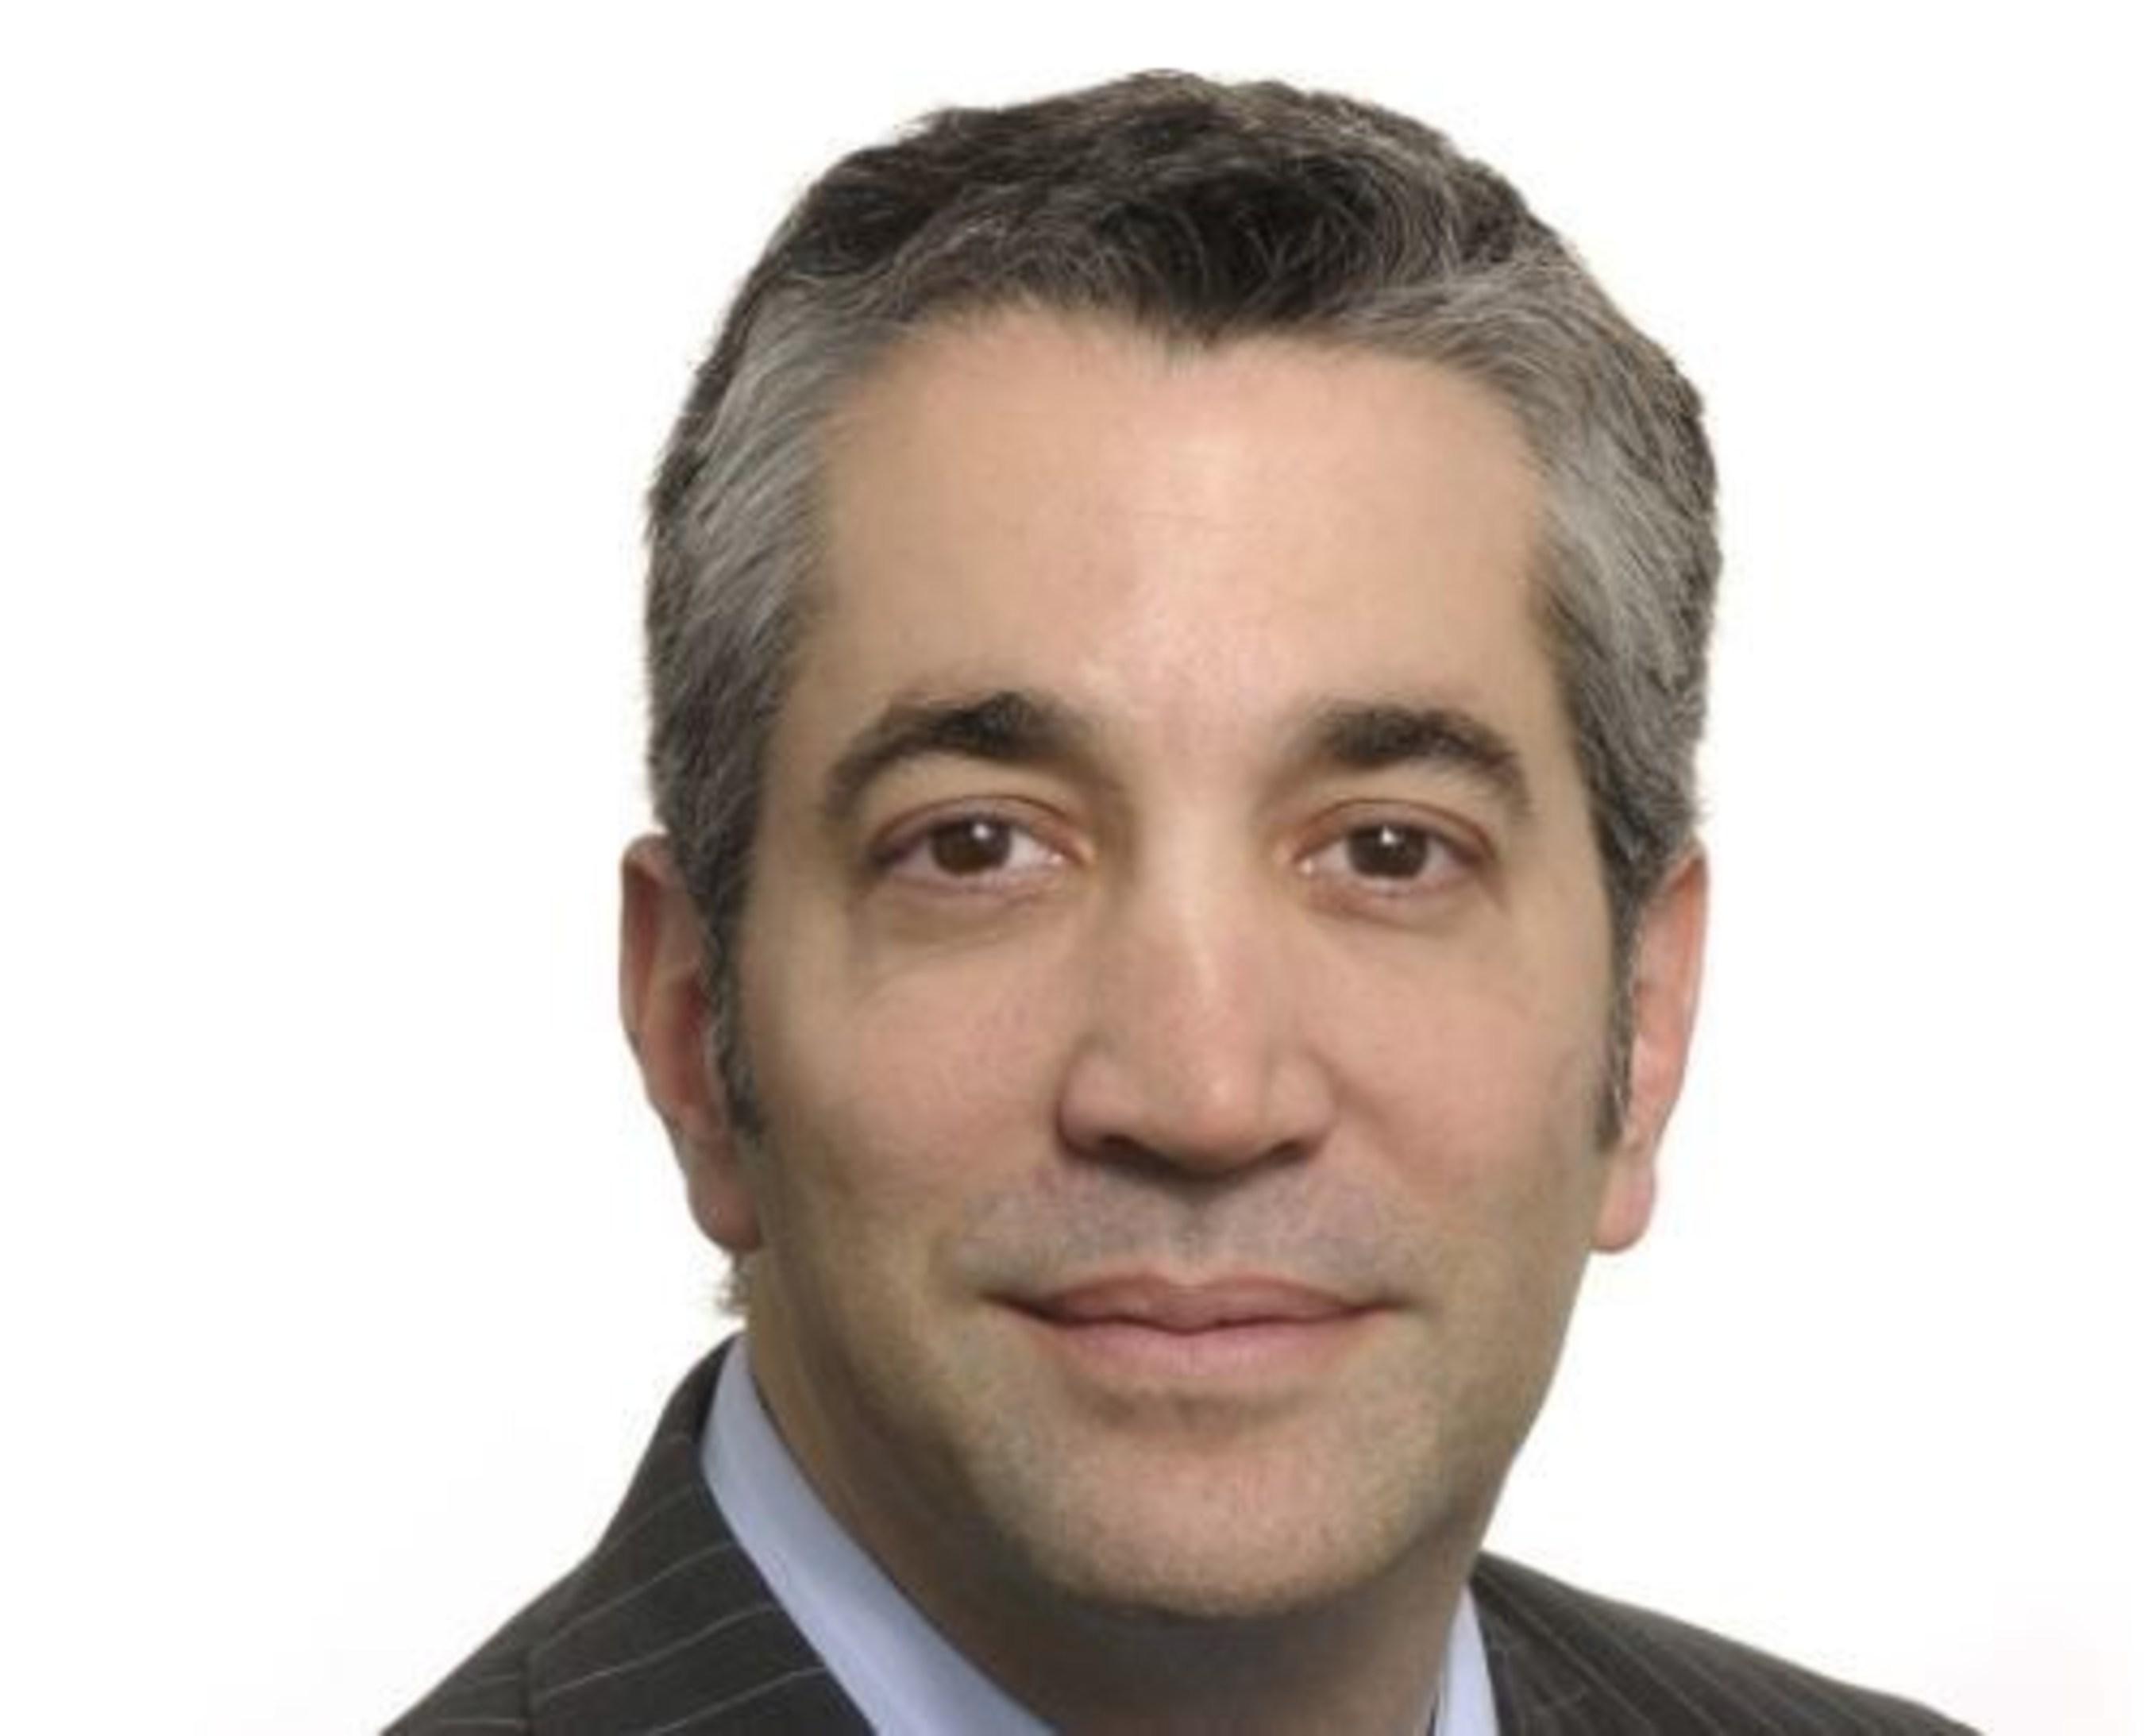 Legal Industry Expert Ben Weinberger Joins Prosperoware